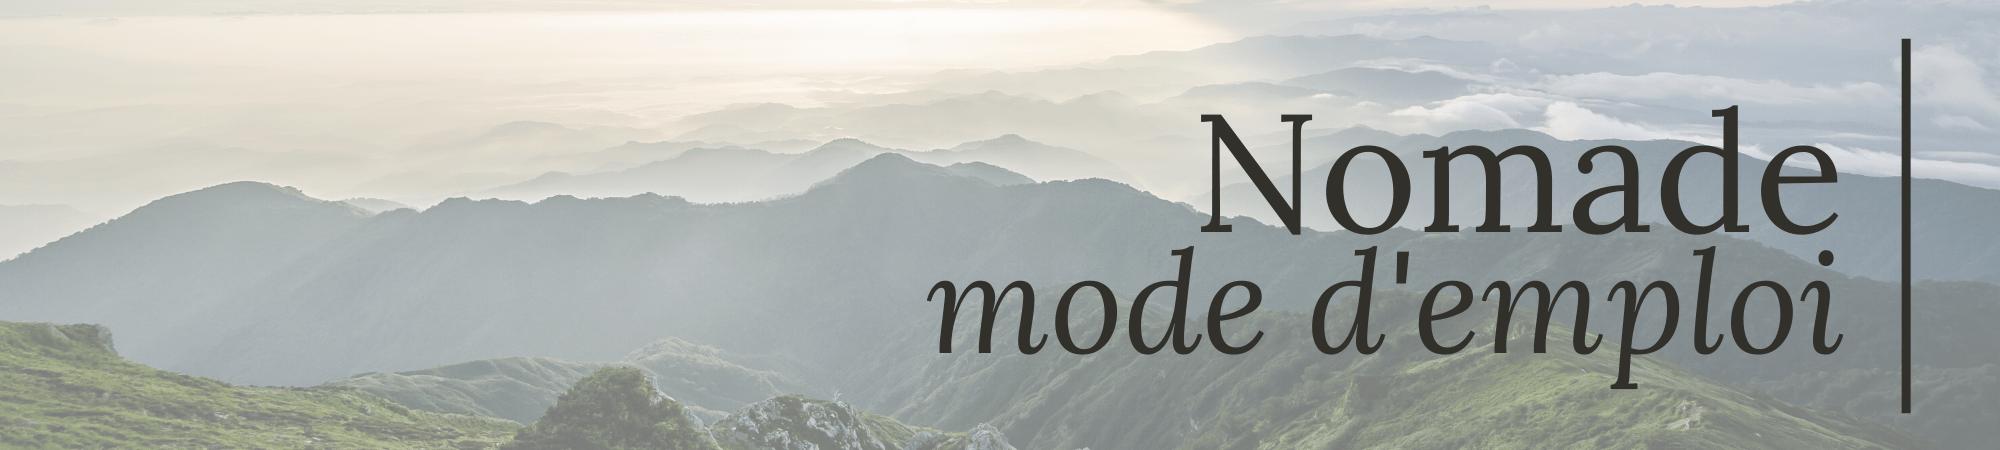 nomade_mode-d-emploi-formation-videos-cadeau